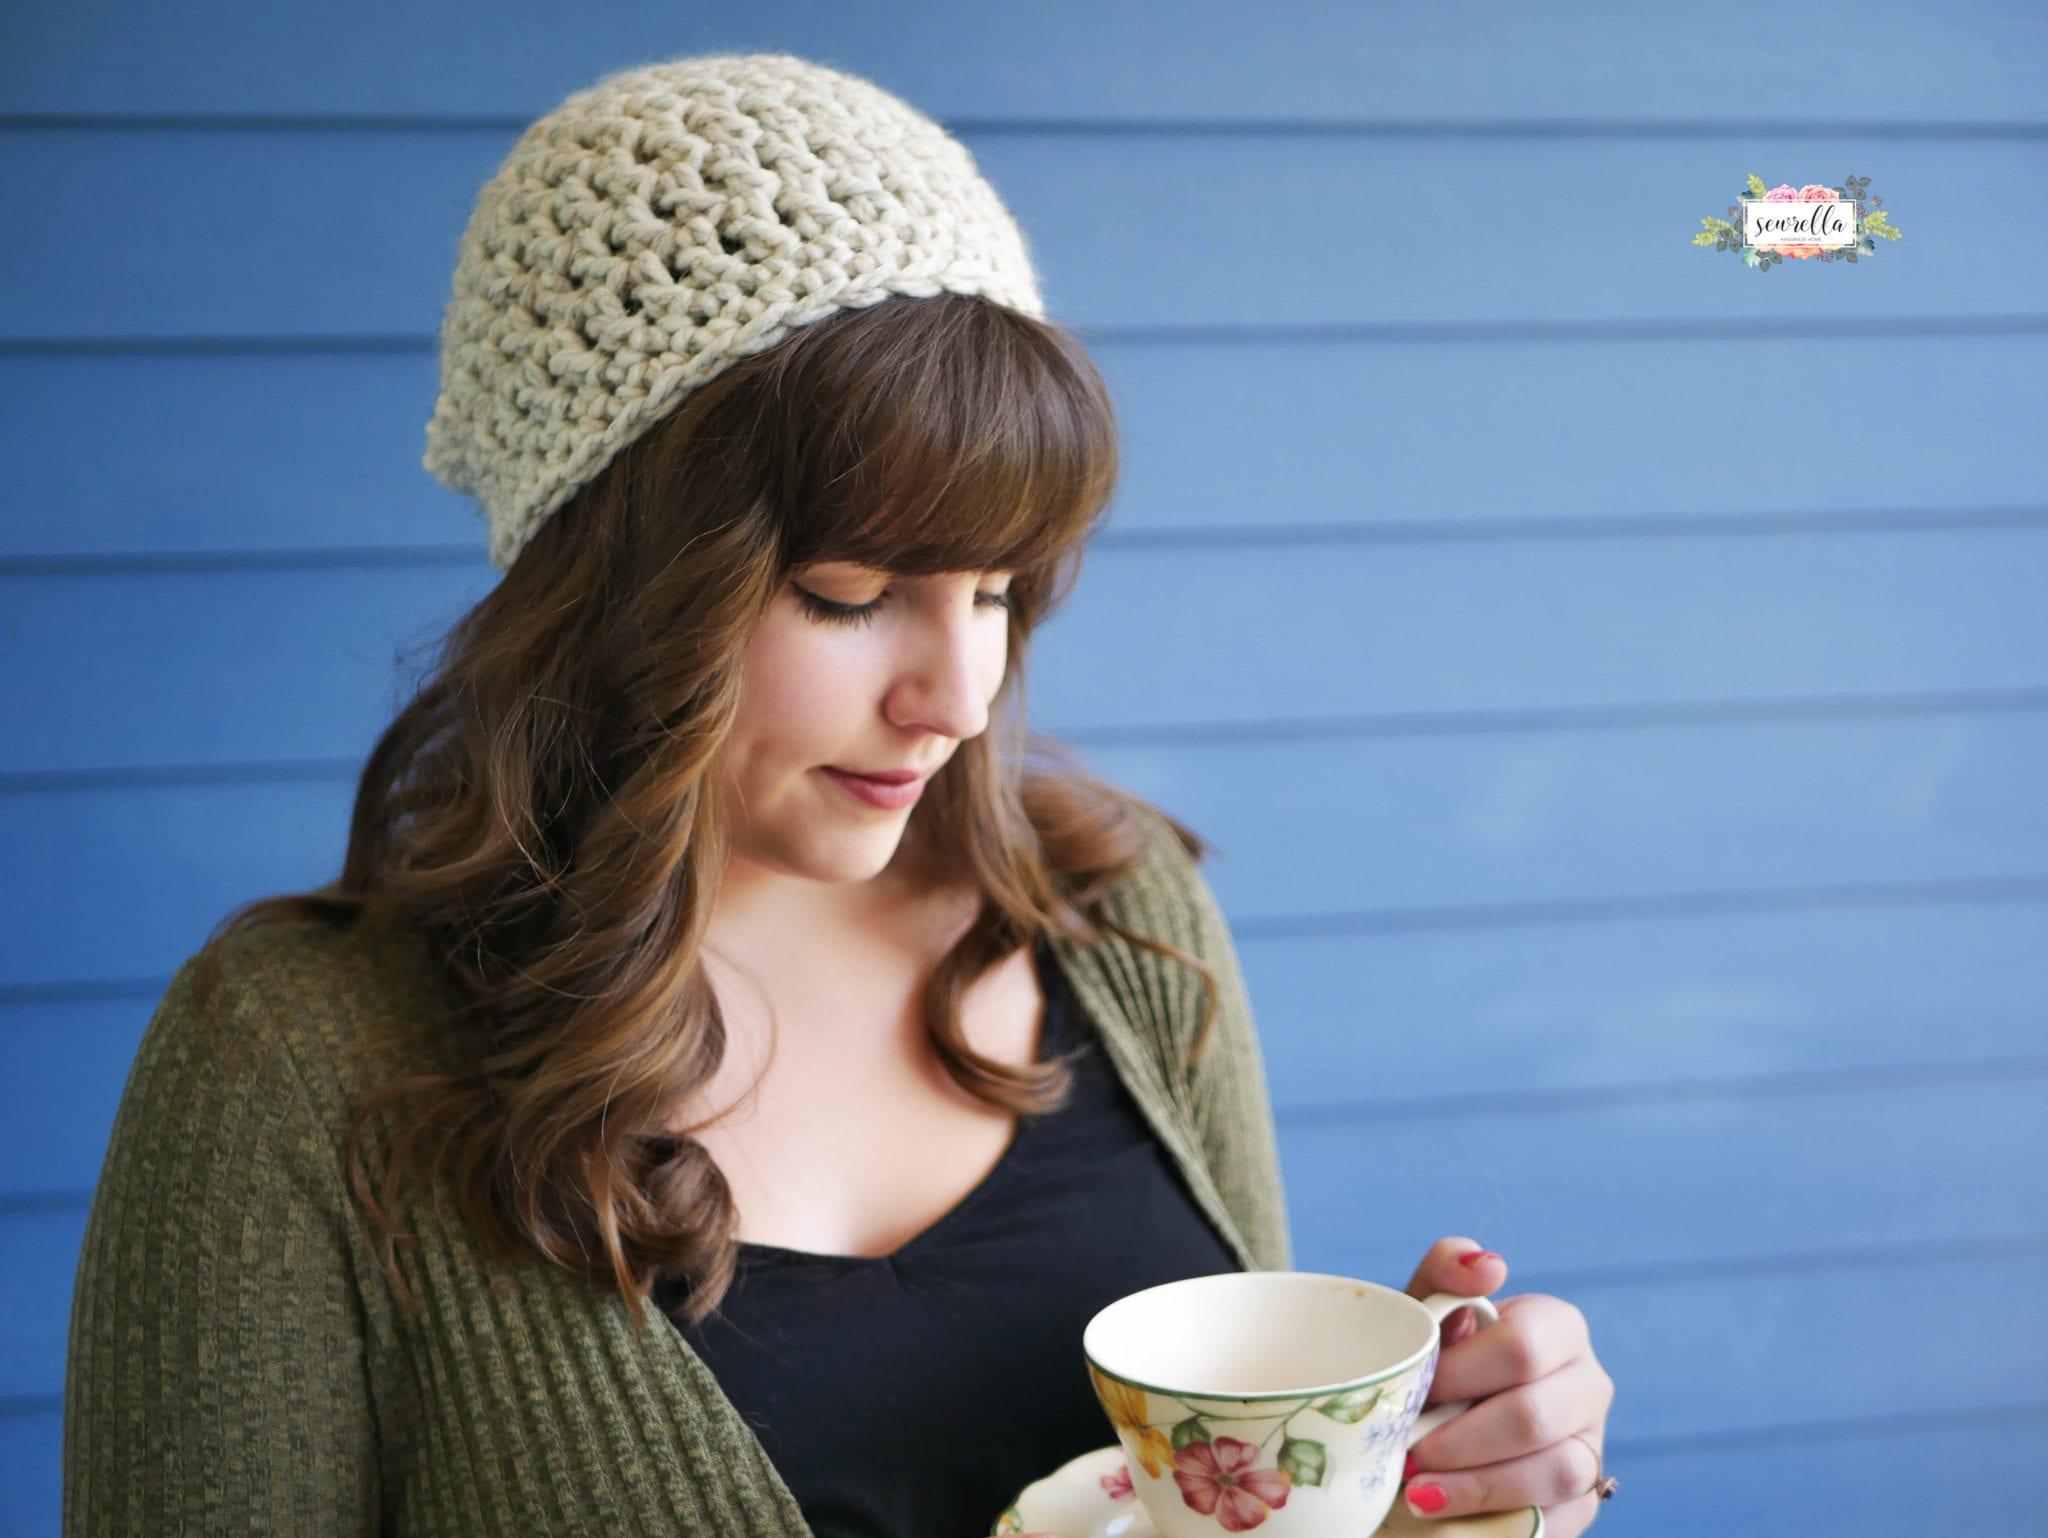 30 Minute Beginner Crochet Slouchy Hat - Sewrella f21c21a68